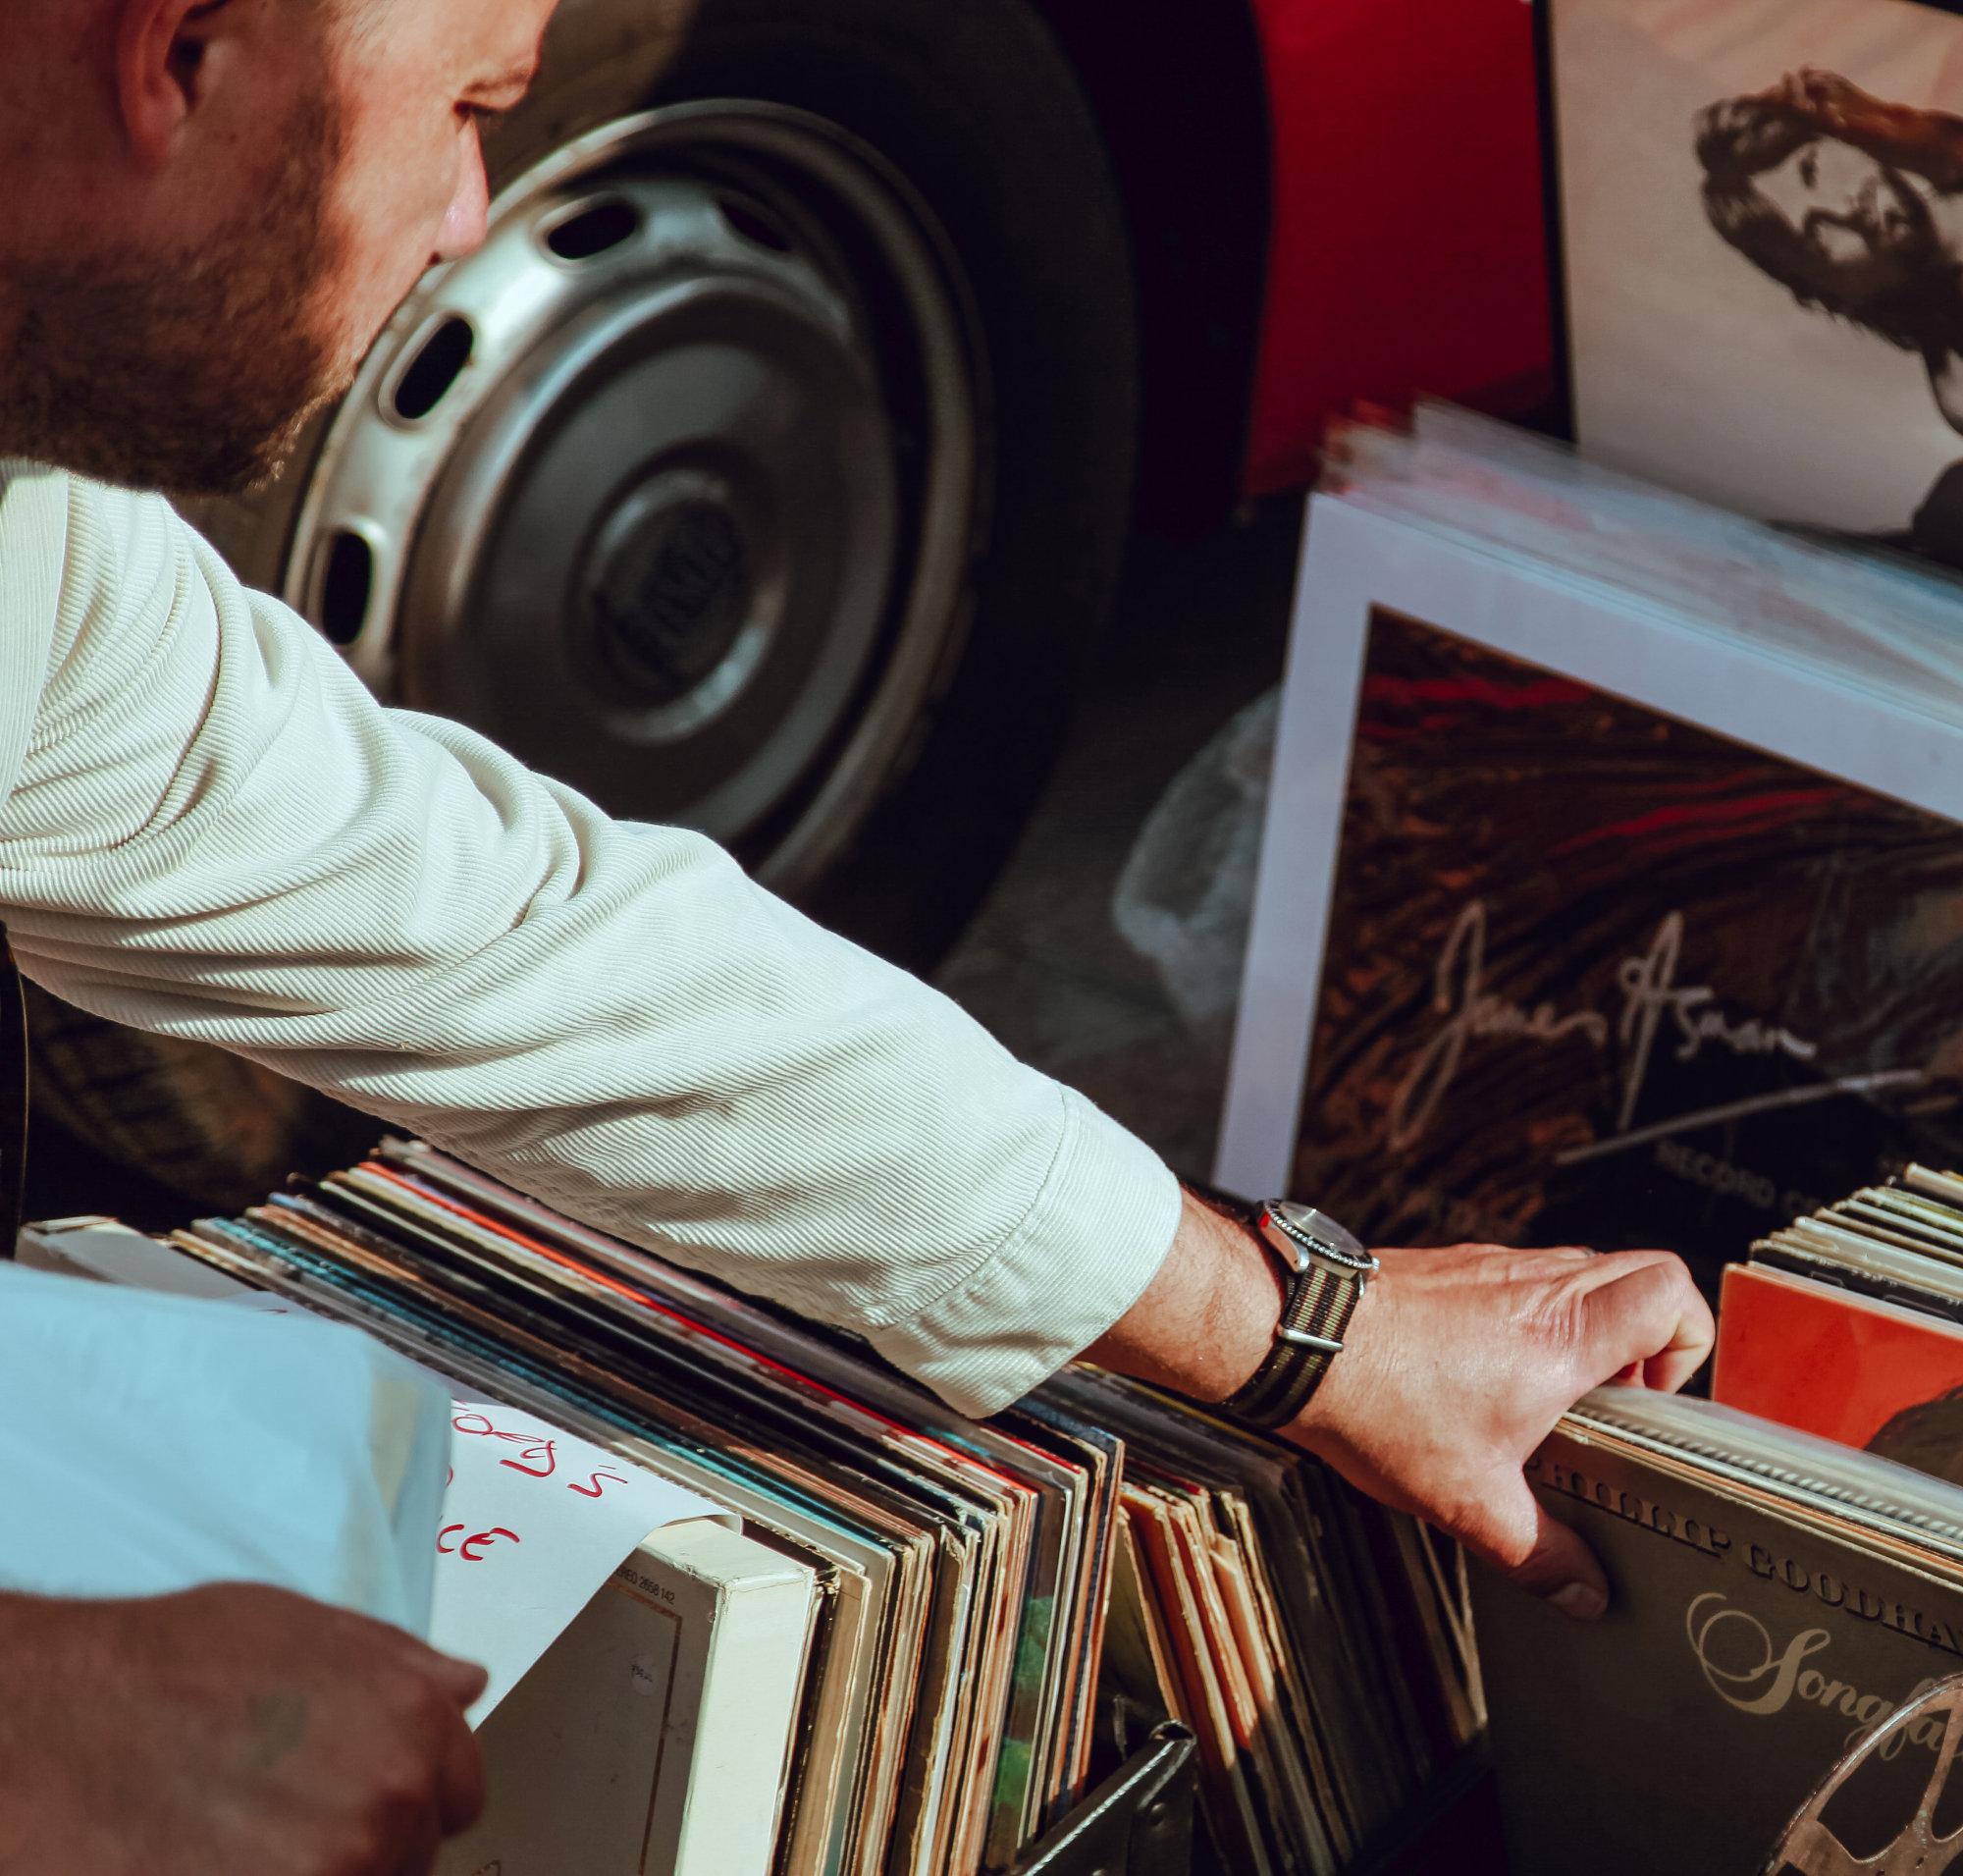 Man searching through vinyl records